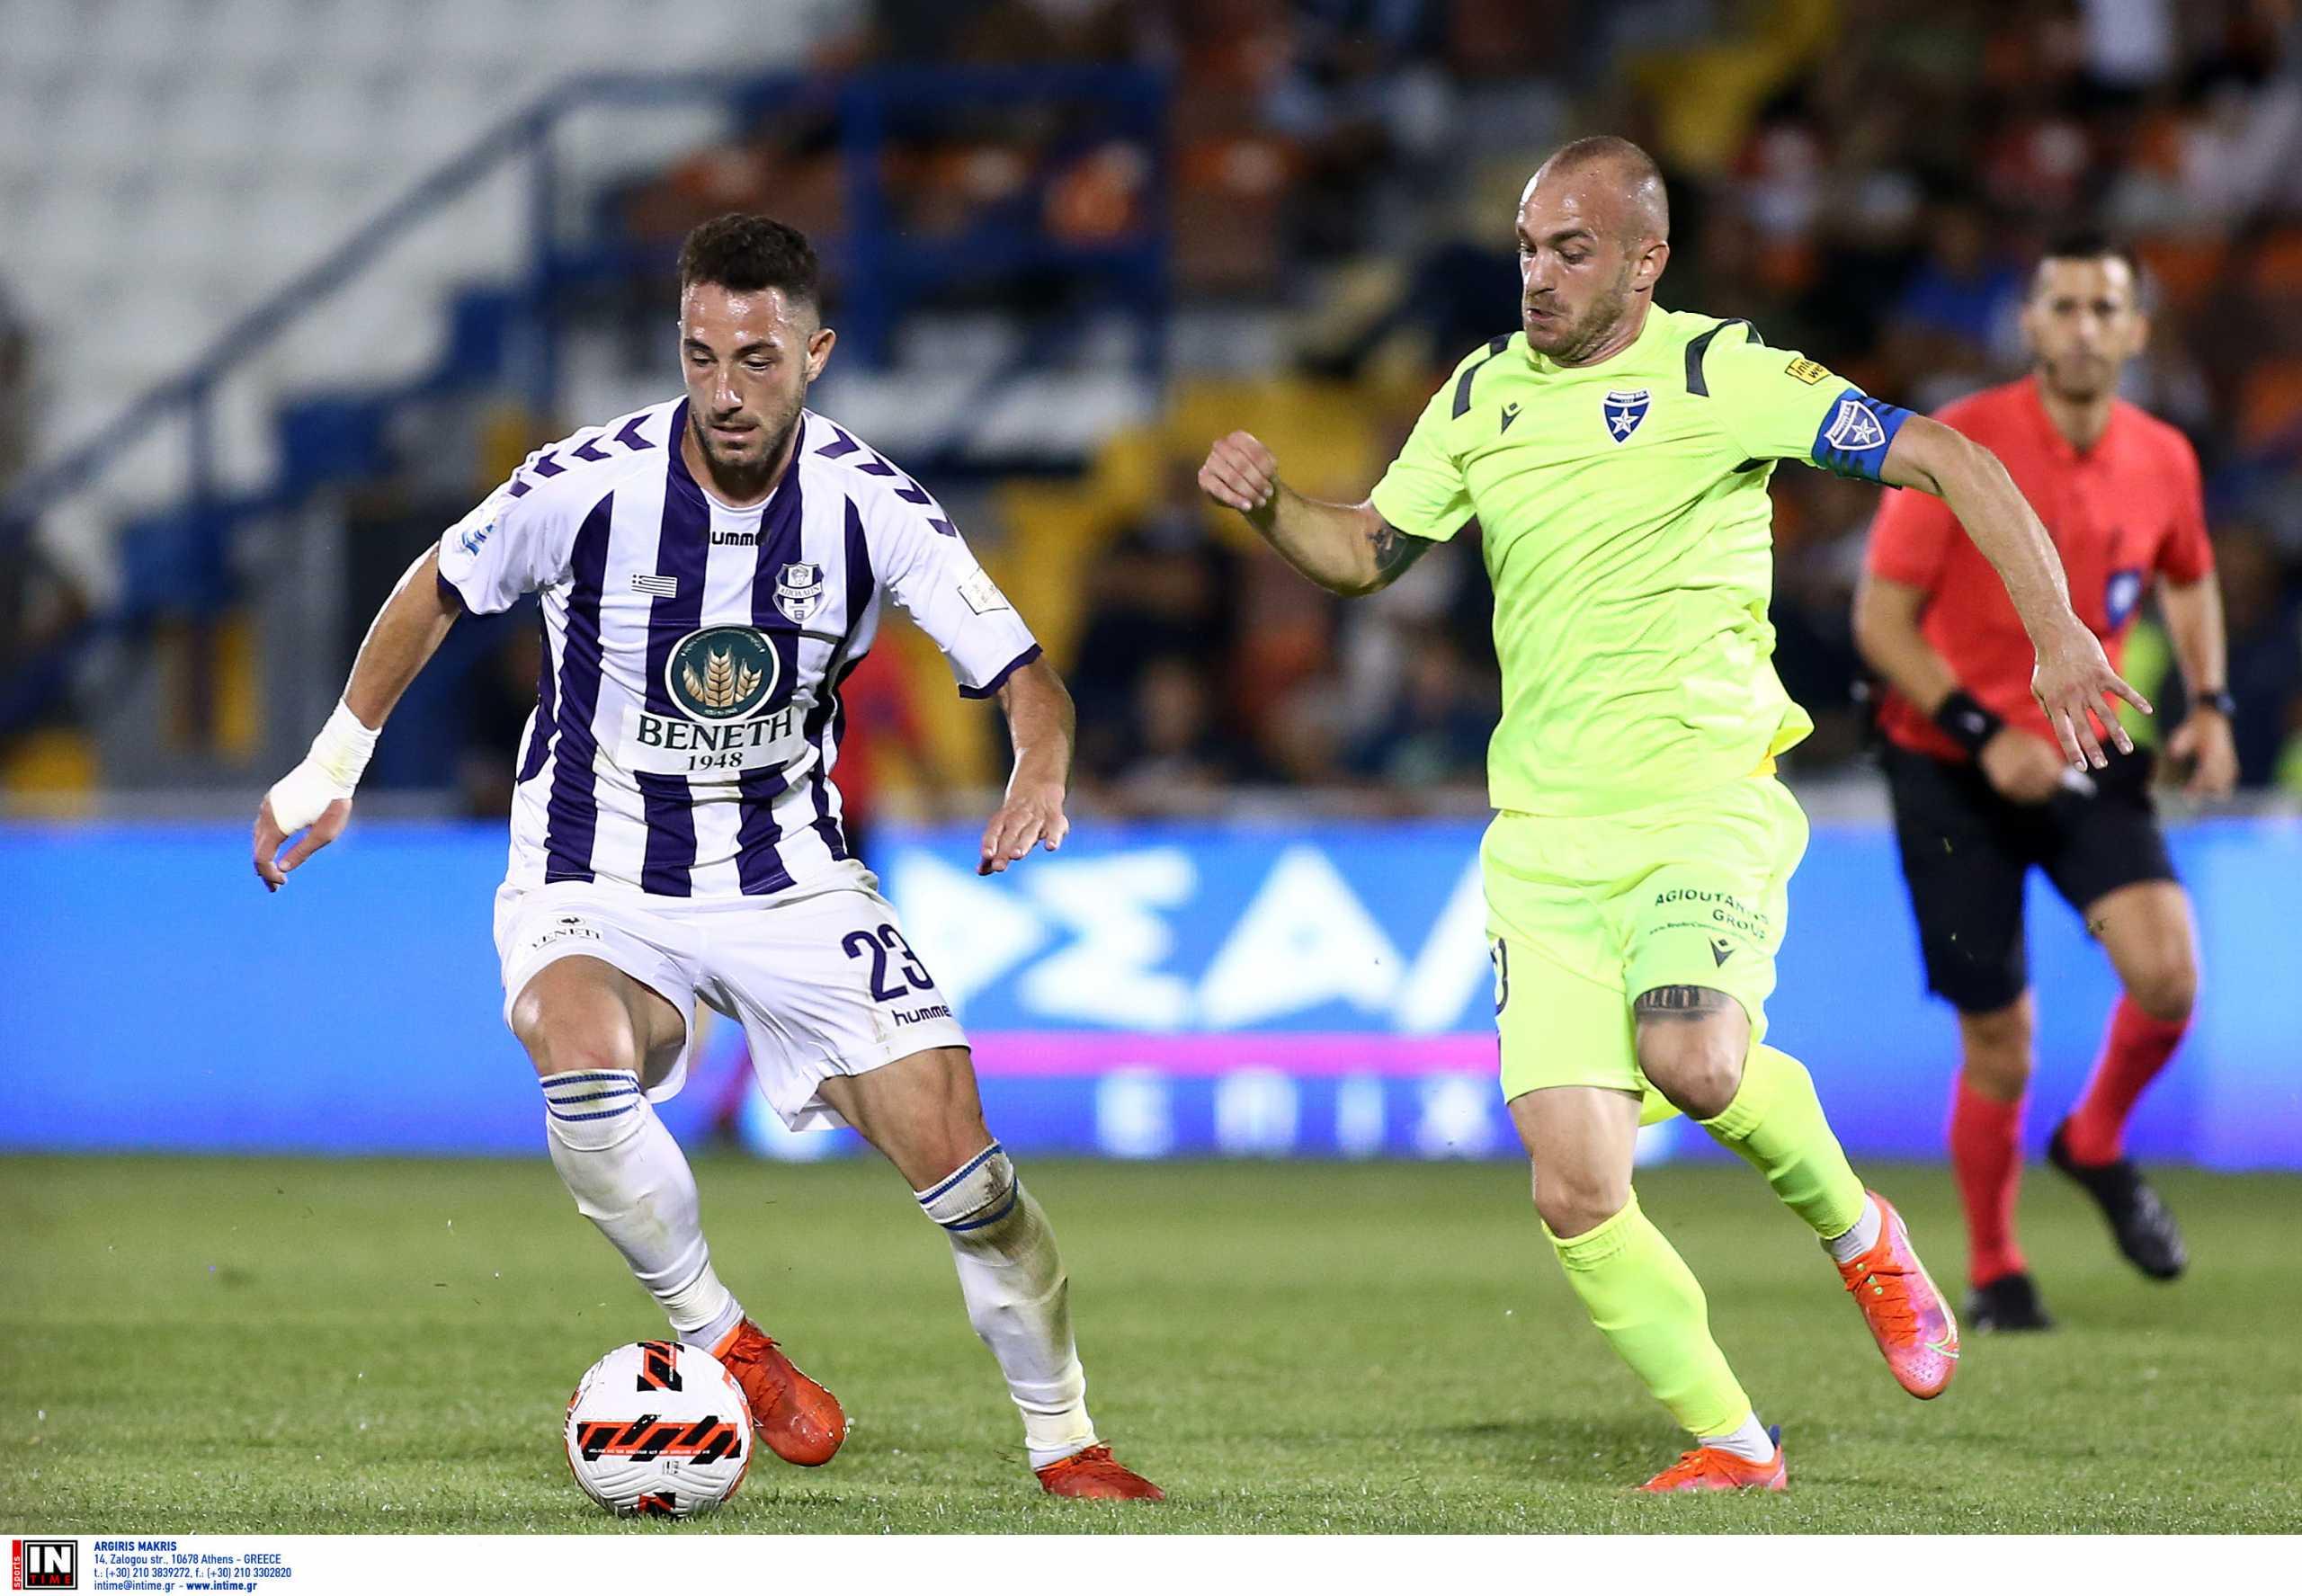 Superleague 1, Απόλλων Σμύρνης – Ιωνικός 0-0: Έλειψε το γκολ στη Ριζούπολη